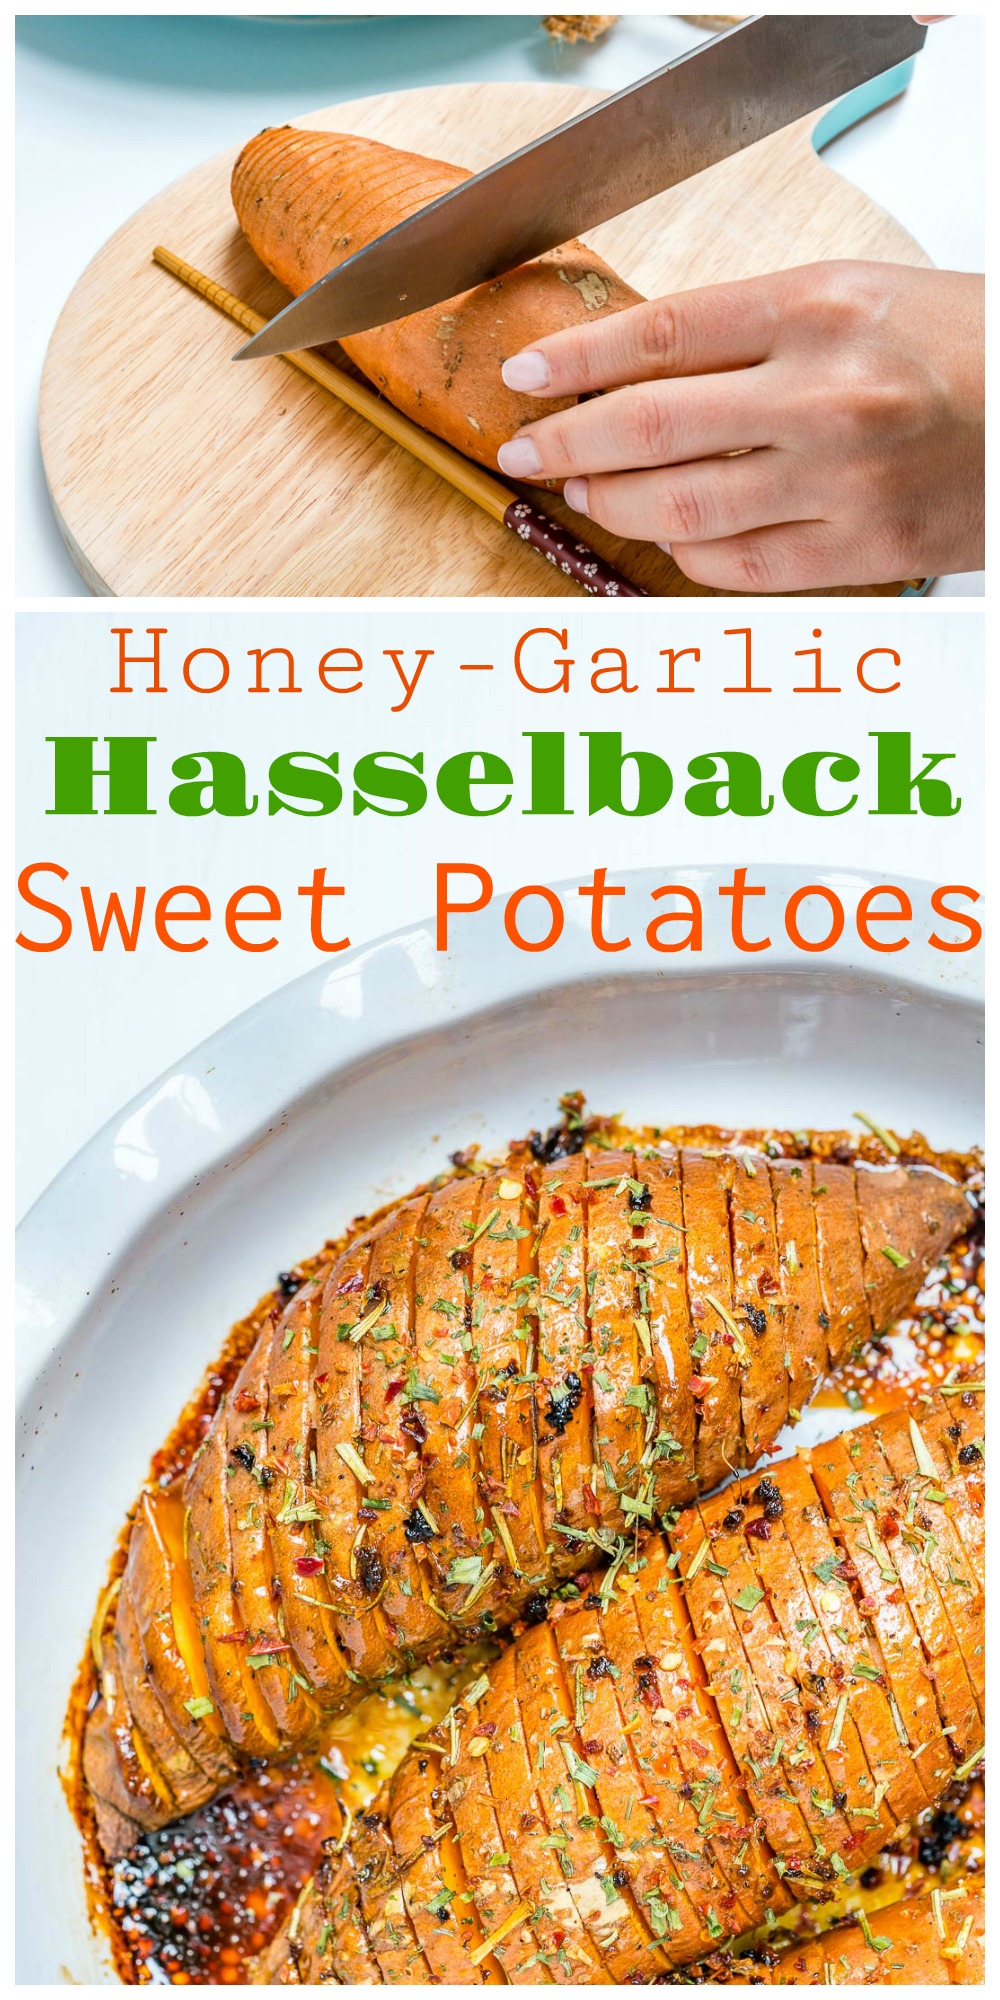 Honey Garlic Hasselback Sweet Potatoes Clean Eating